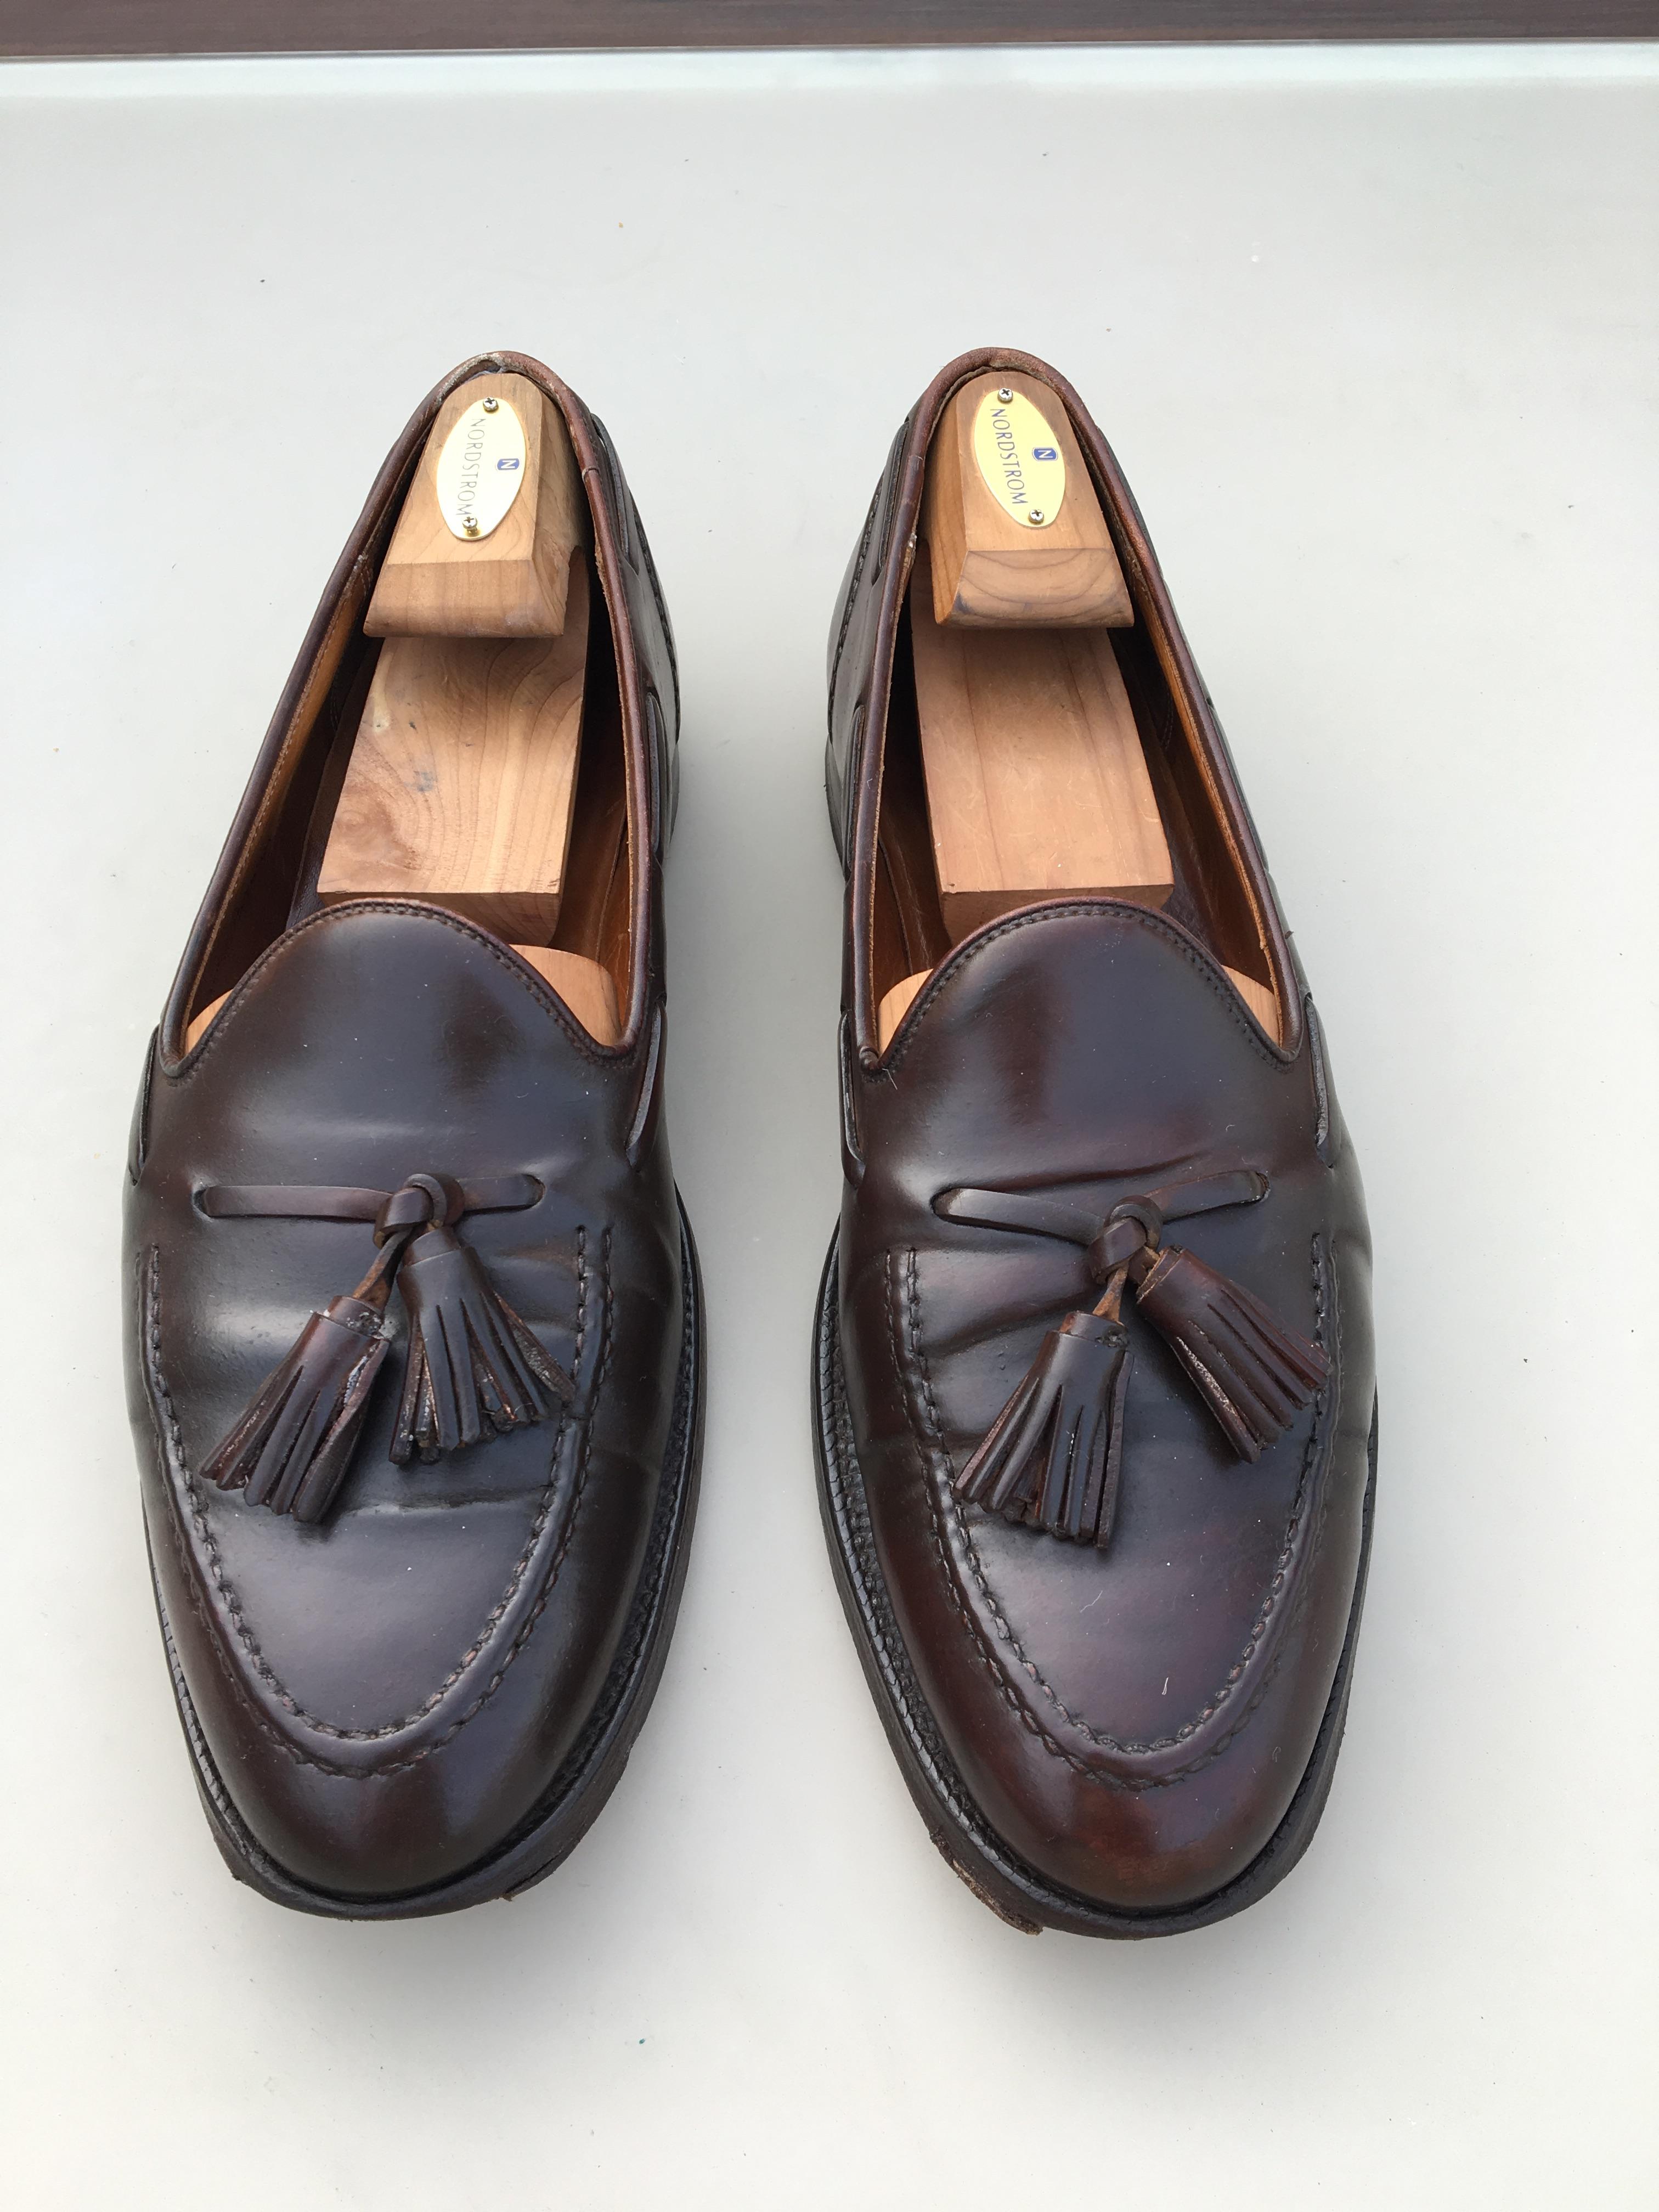 32bbc472560 Ralph Lauren Marlow Shell Cordovan Tassel Loafer